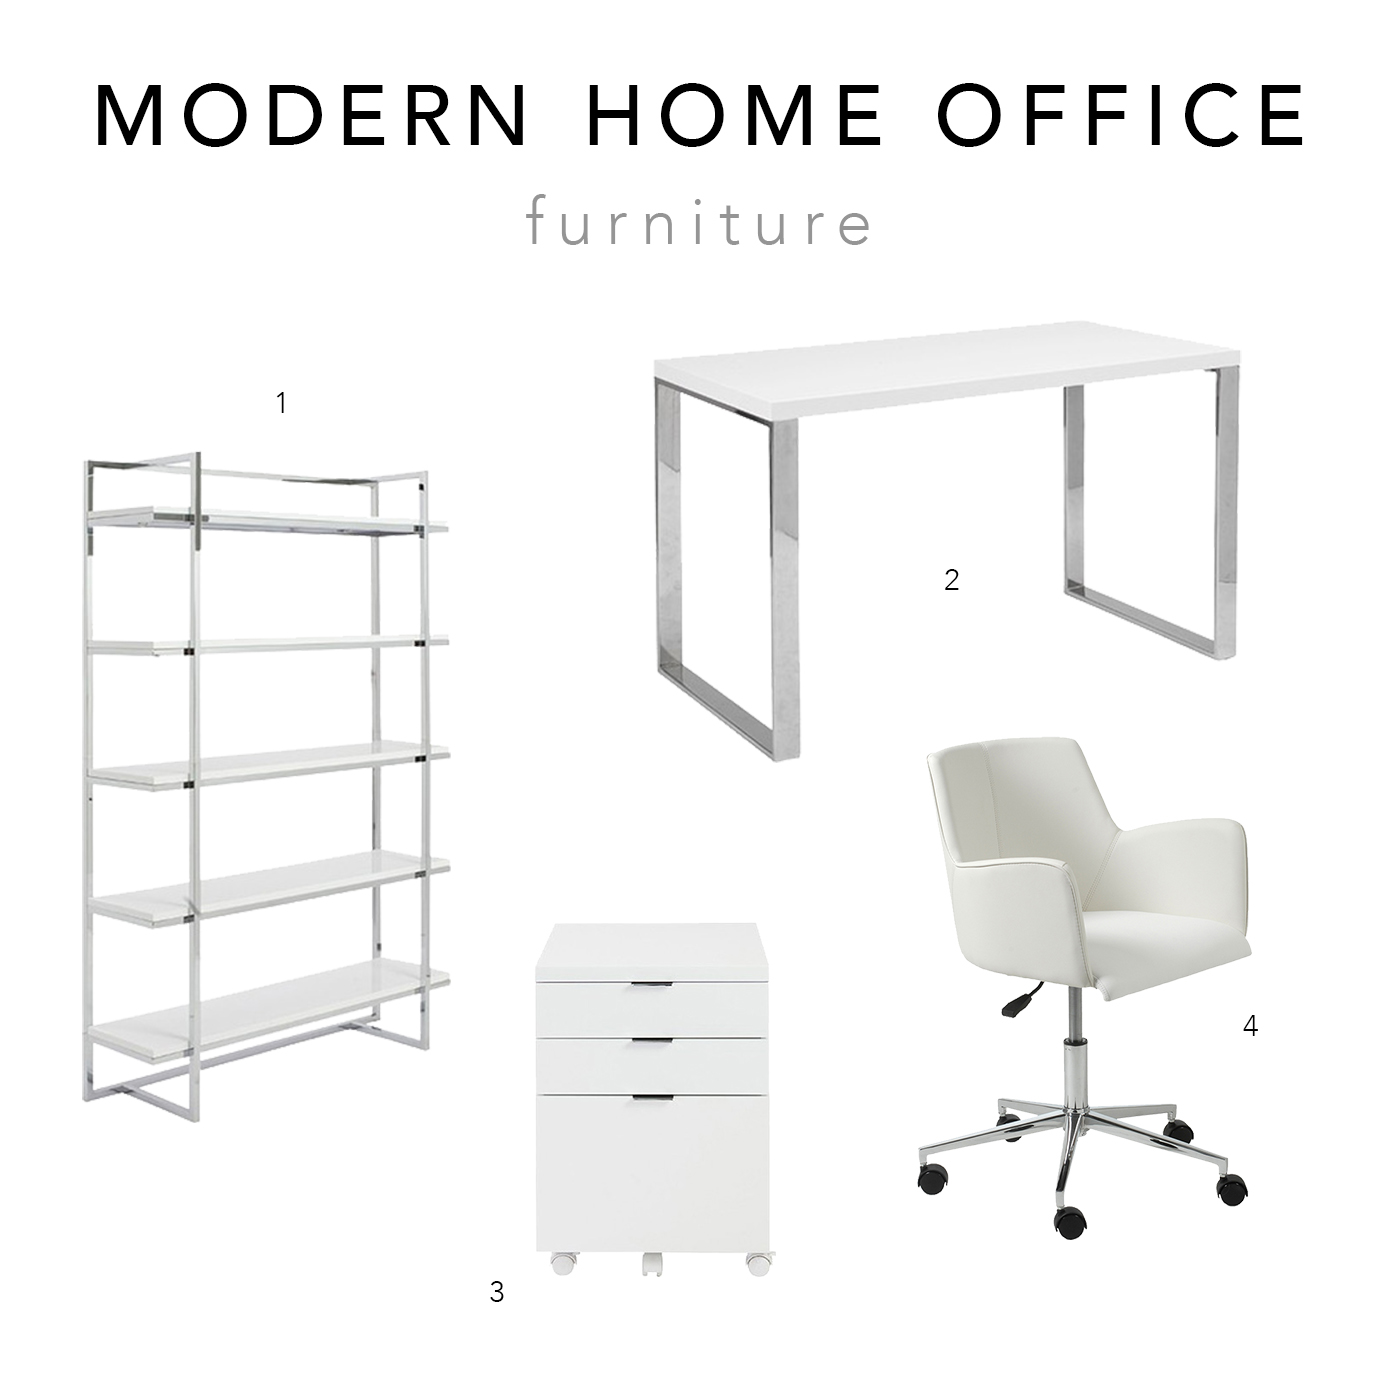 Dot & Bo Modern Home Office Furniture | via The Chic Diary